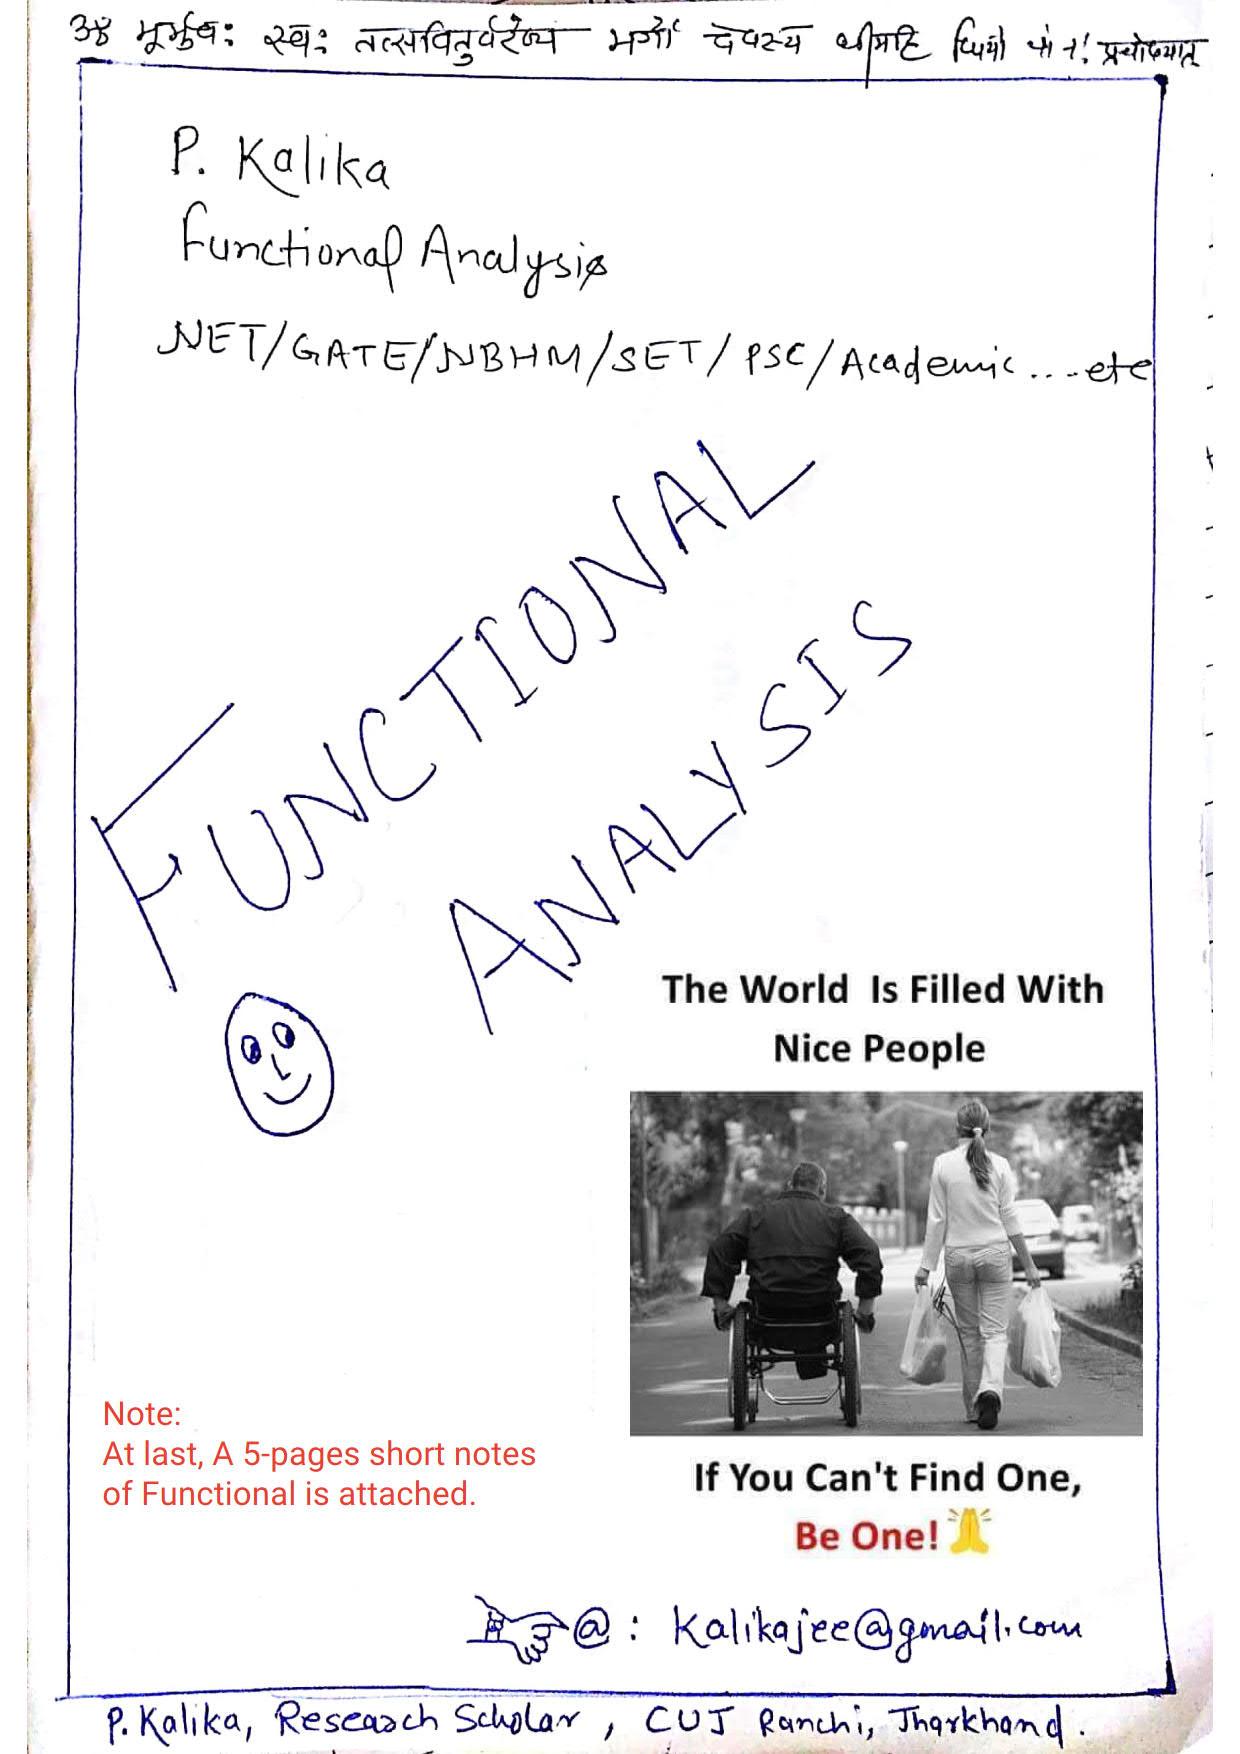 Functional Analysis by 58pages(Kalika)_1